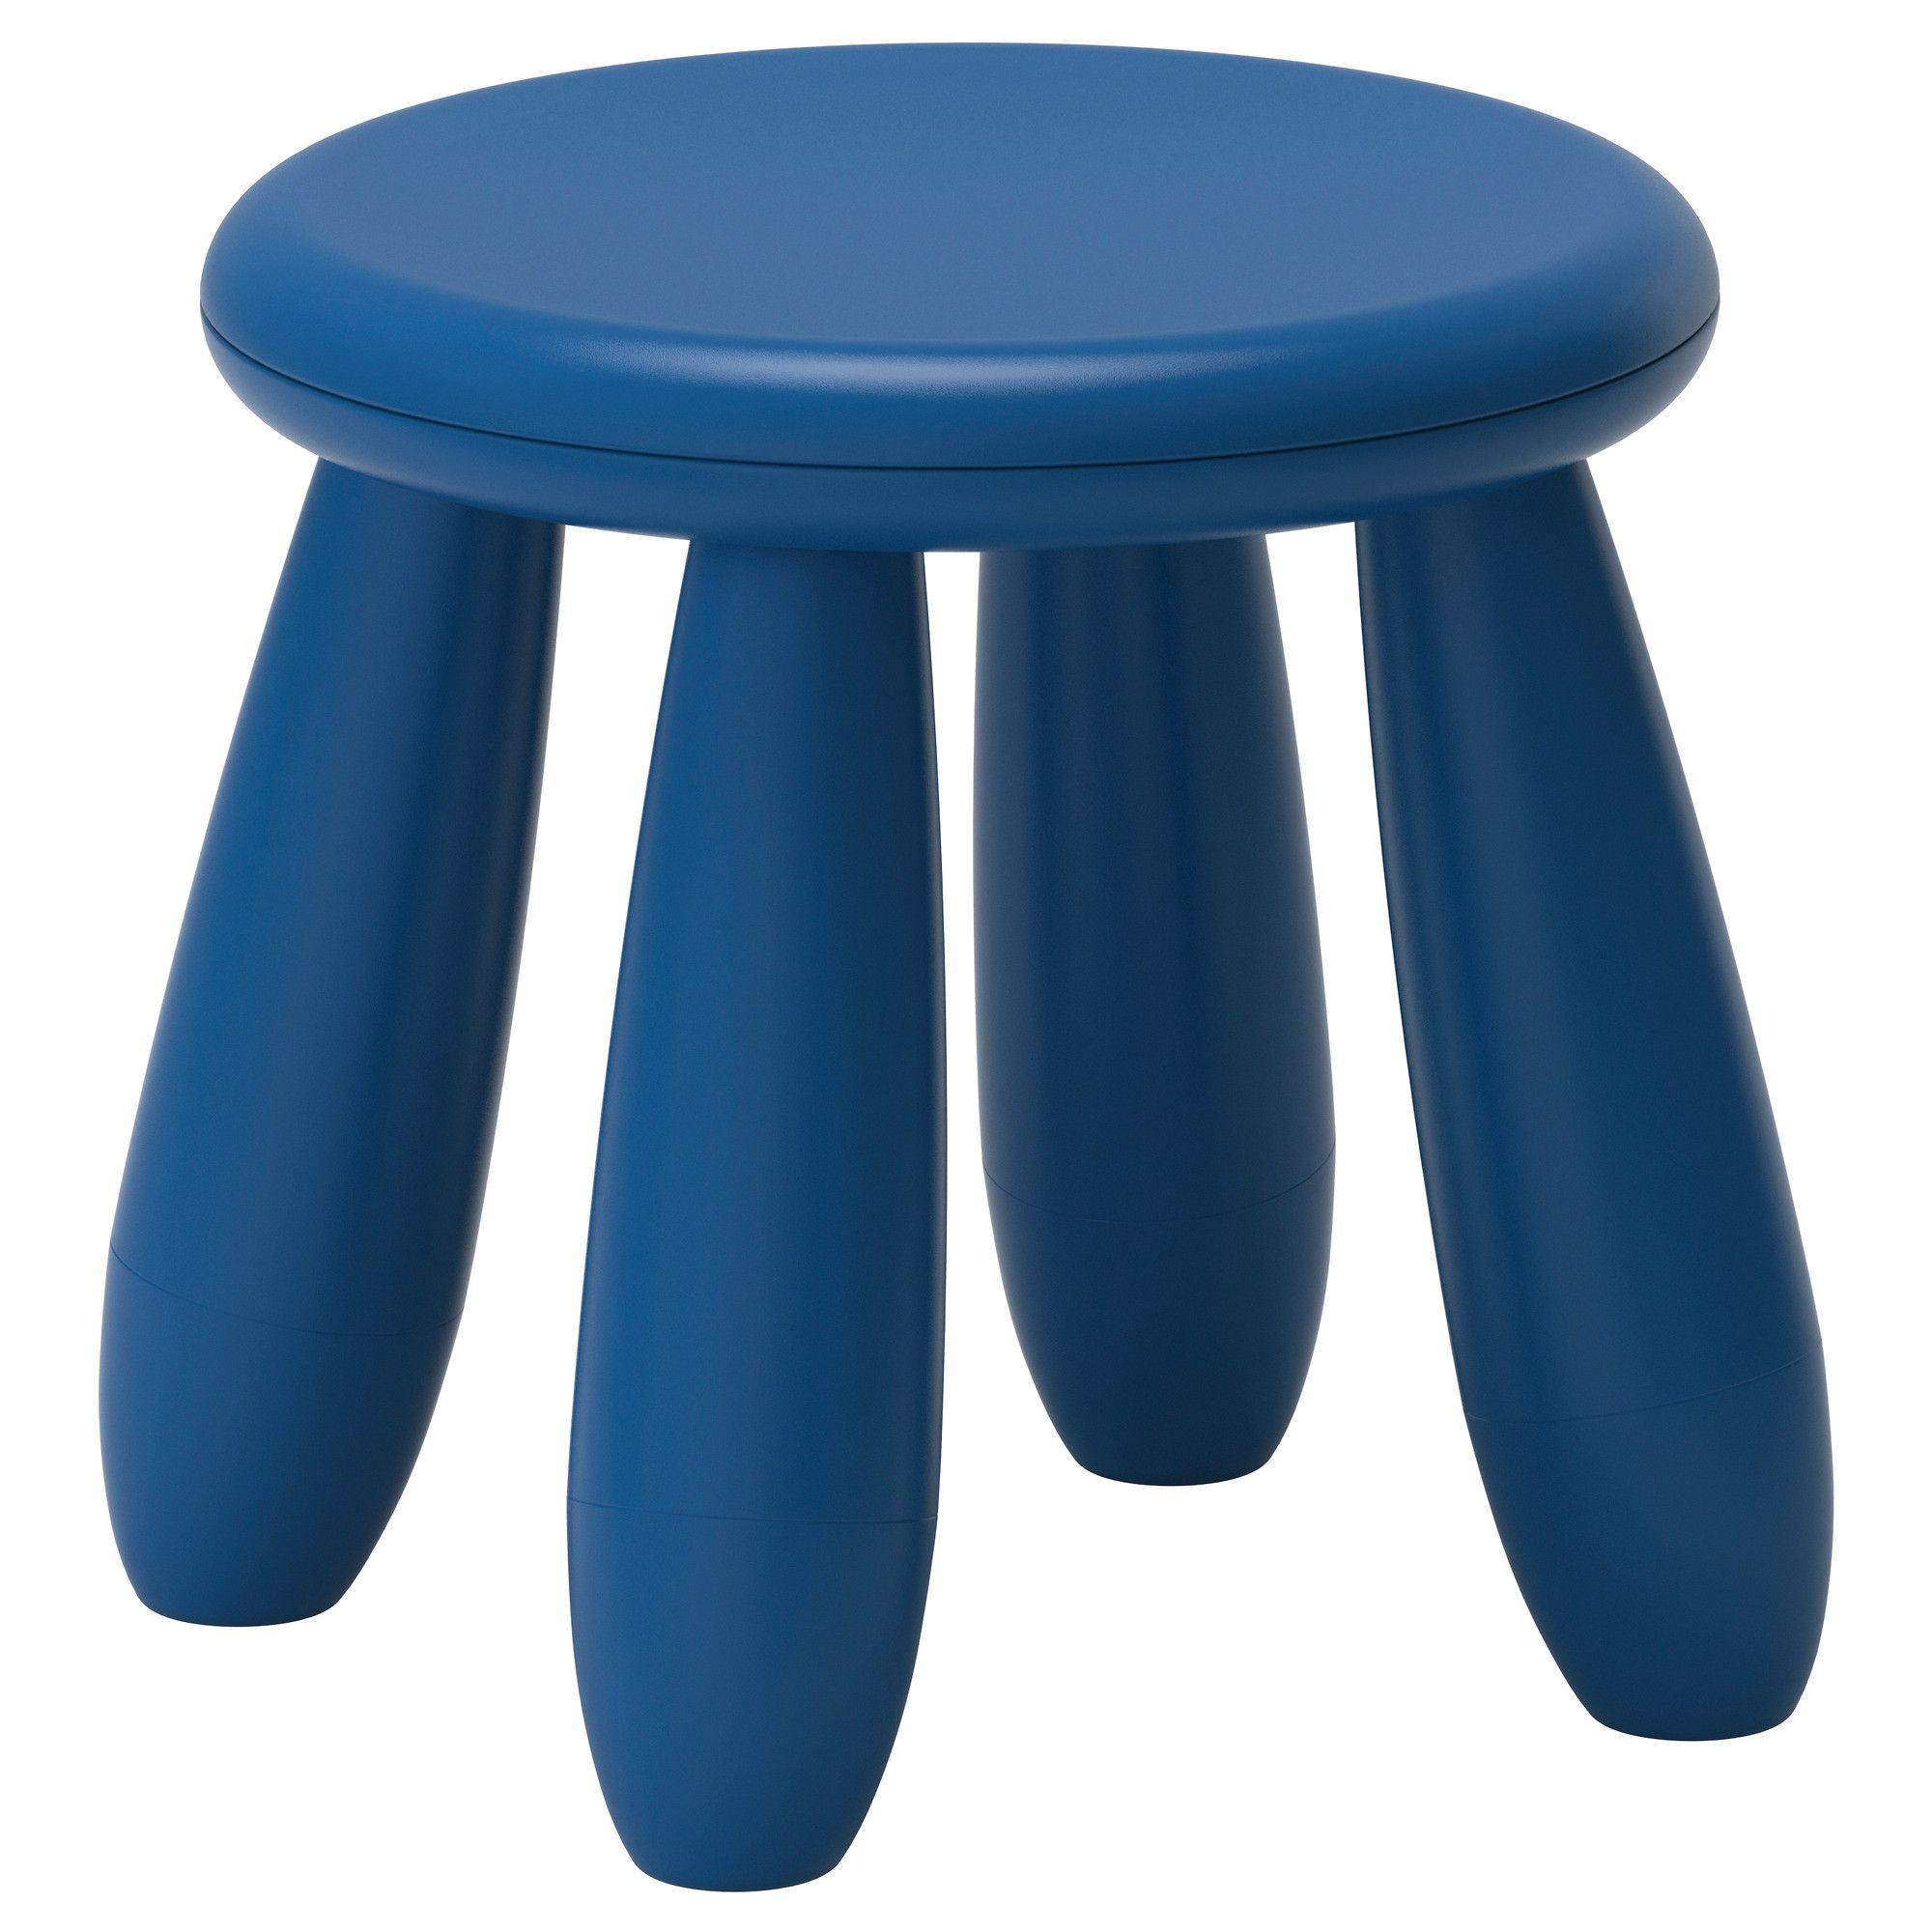 MAMMUT Children s stool dark blue $7 99 Width 13 3 4